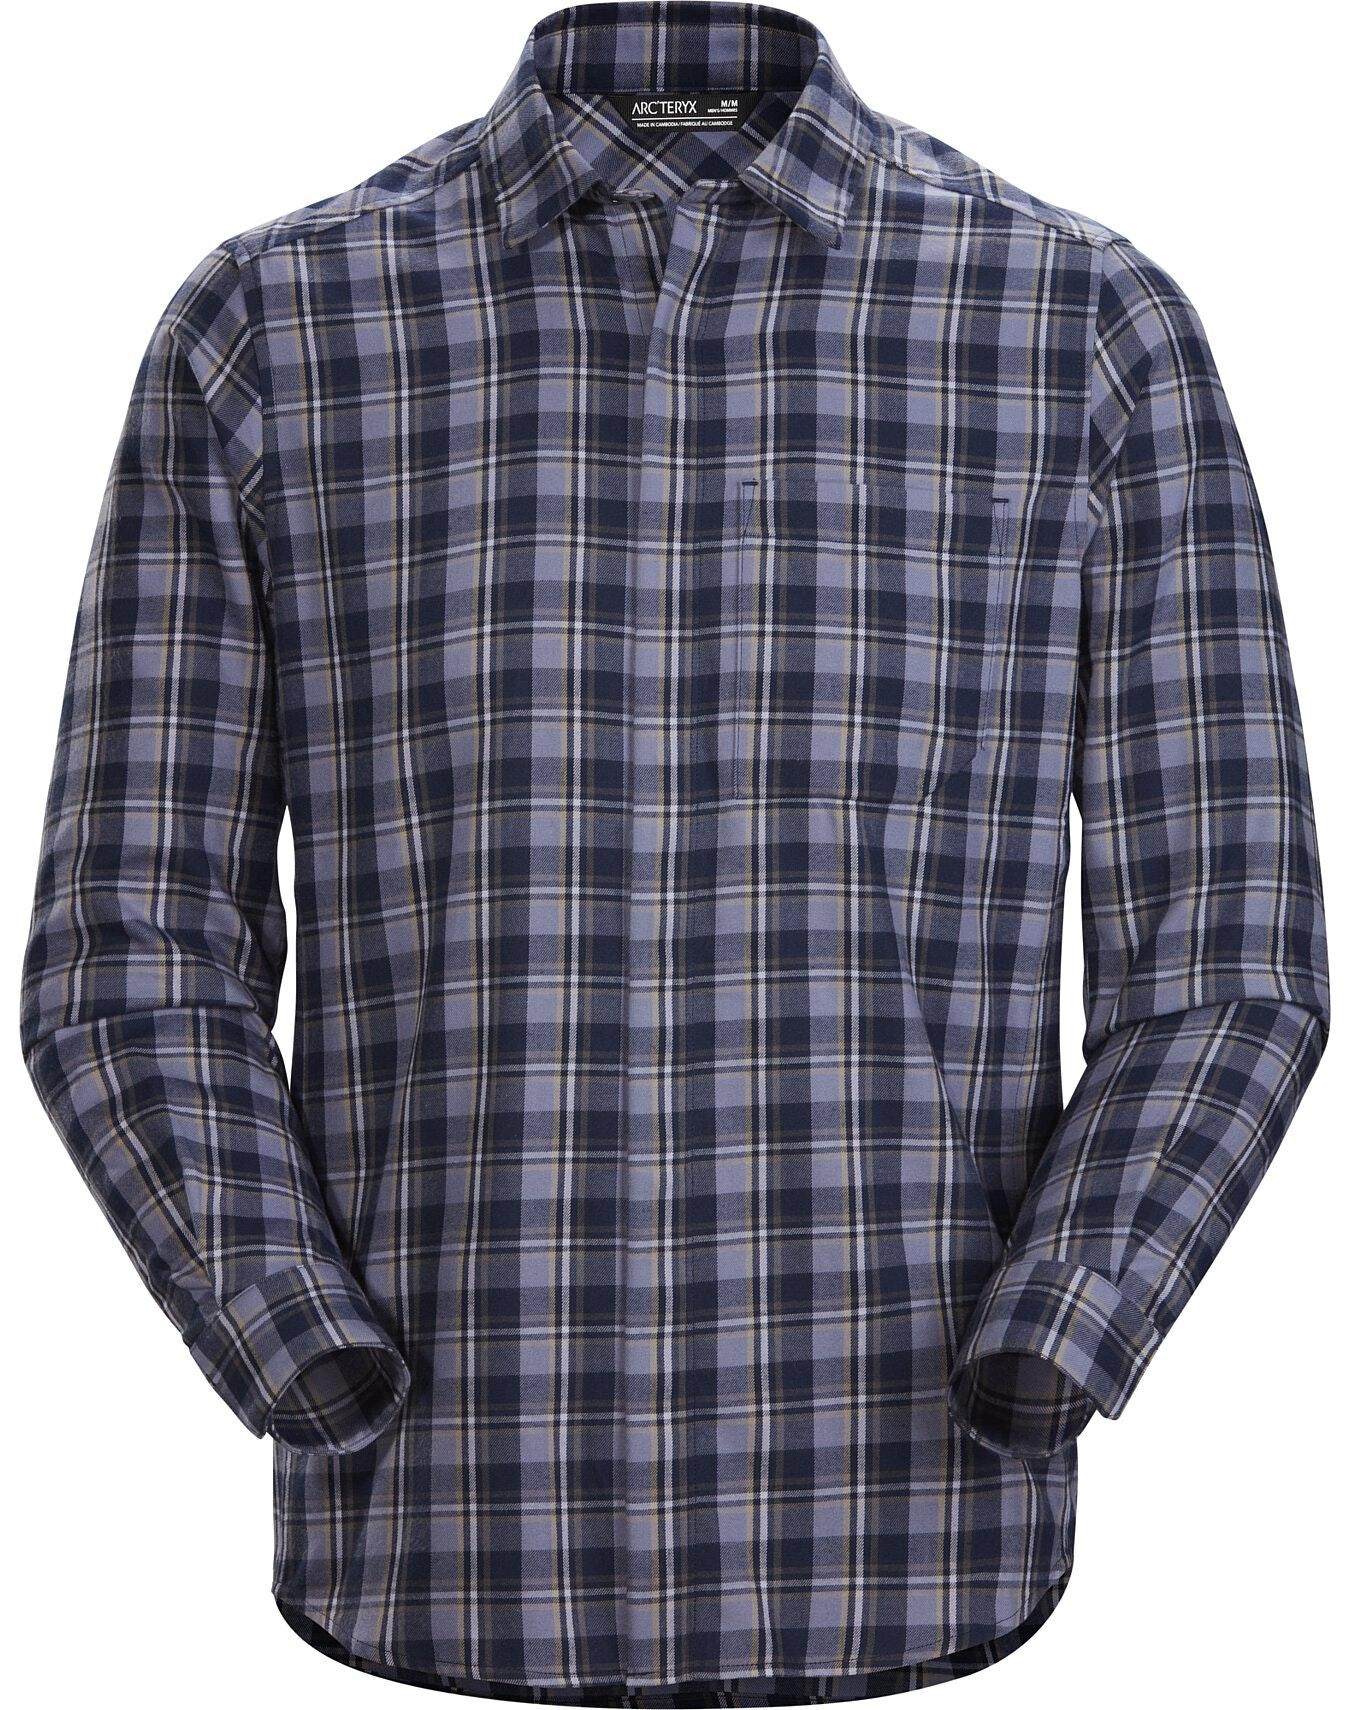 Bernal Shirt LS King's Quandary